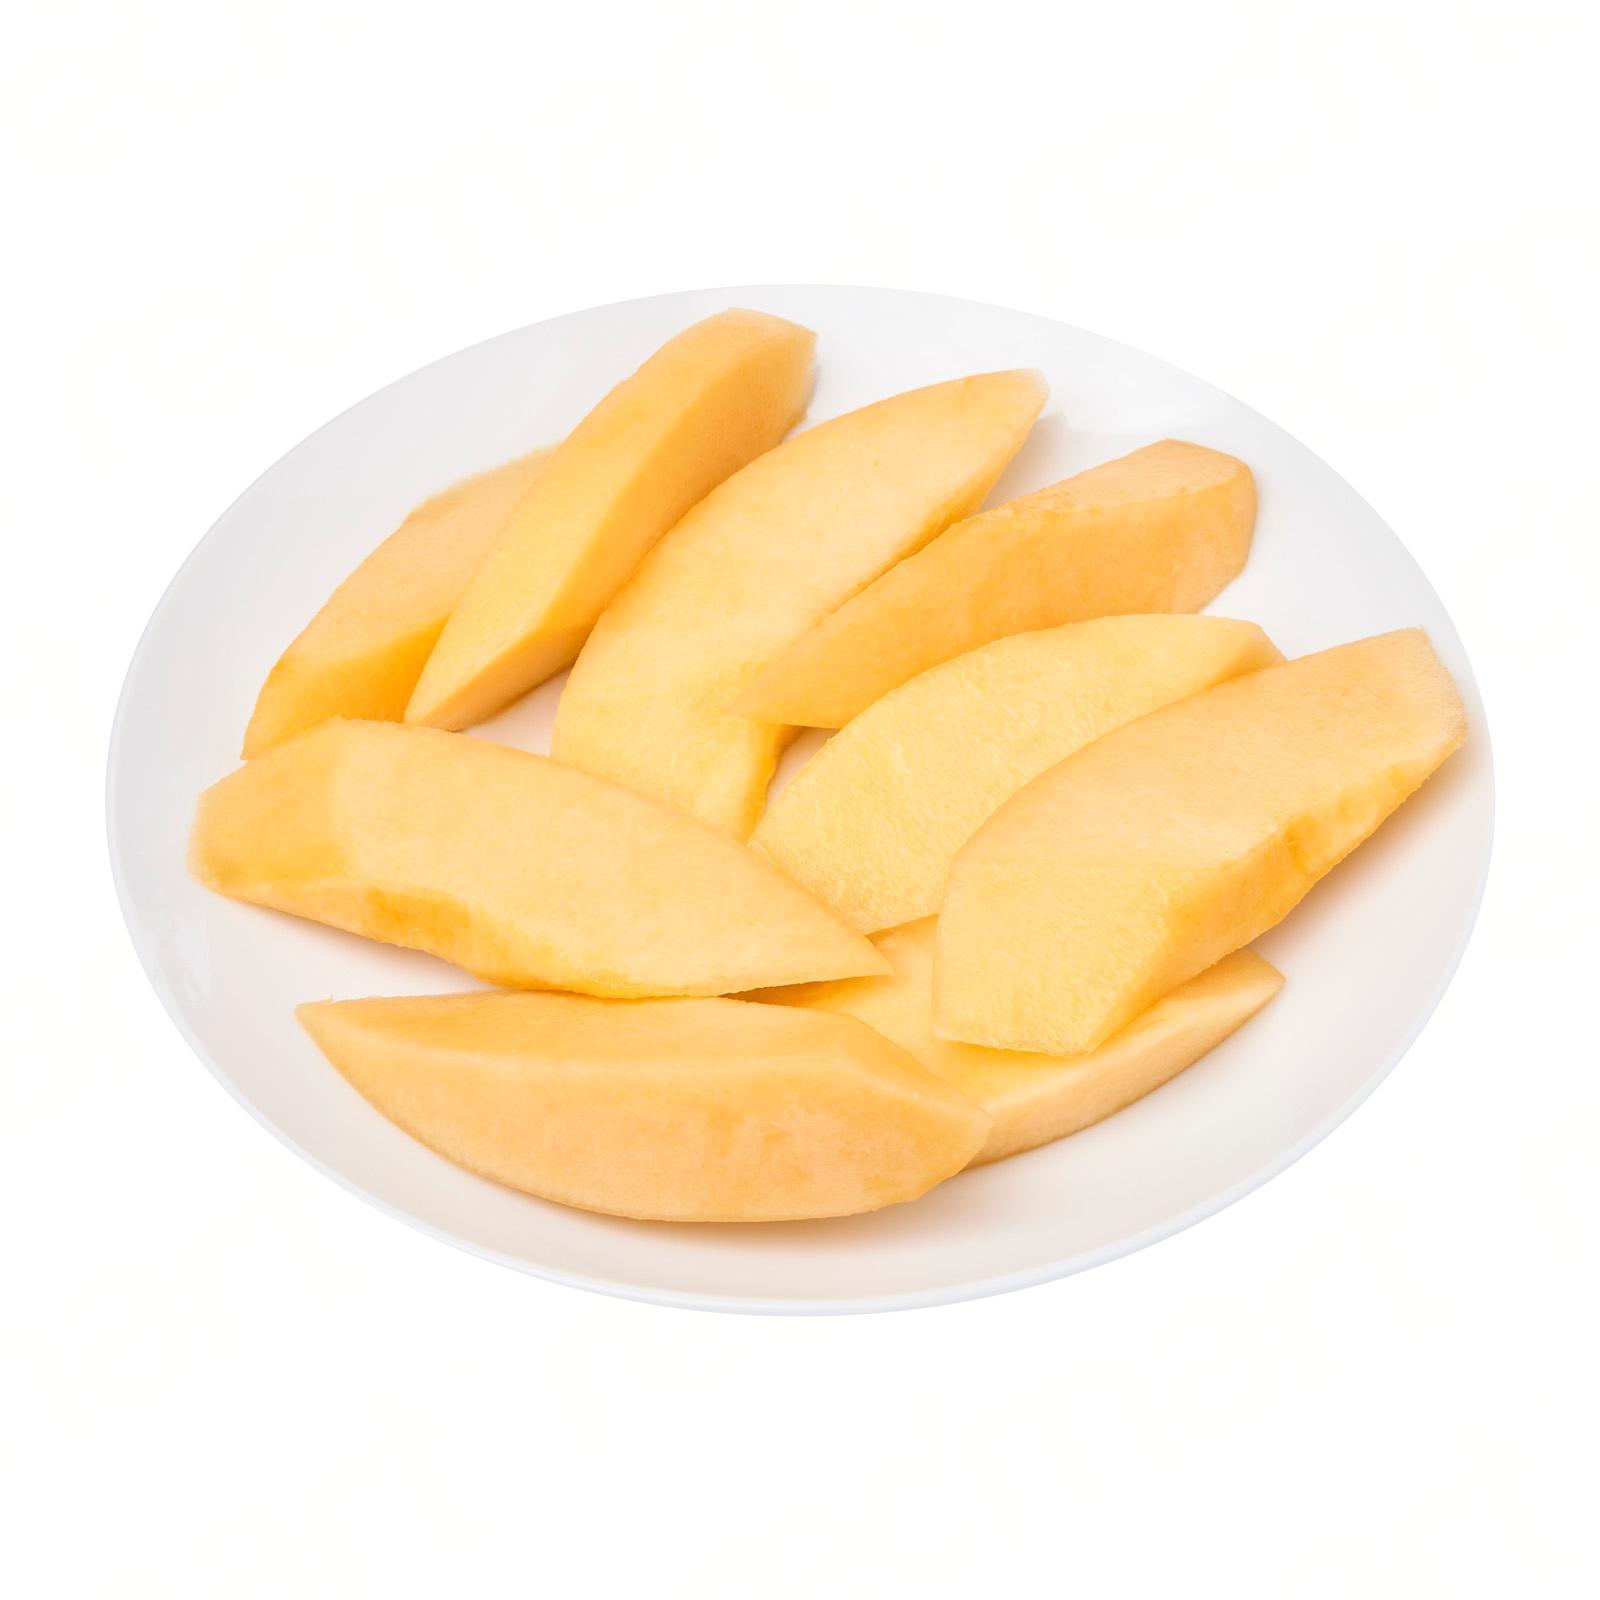 Sunny Fruit Fresh Rockmelon Sliced